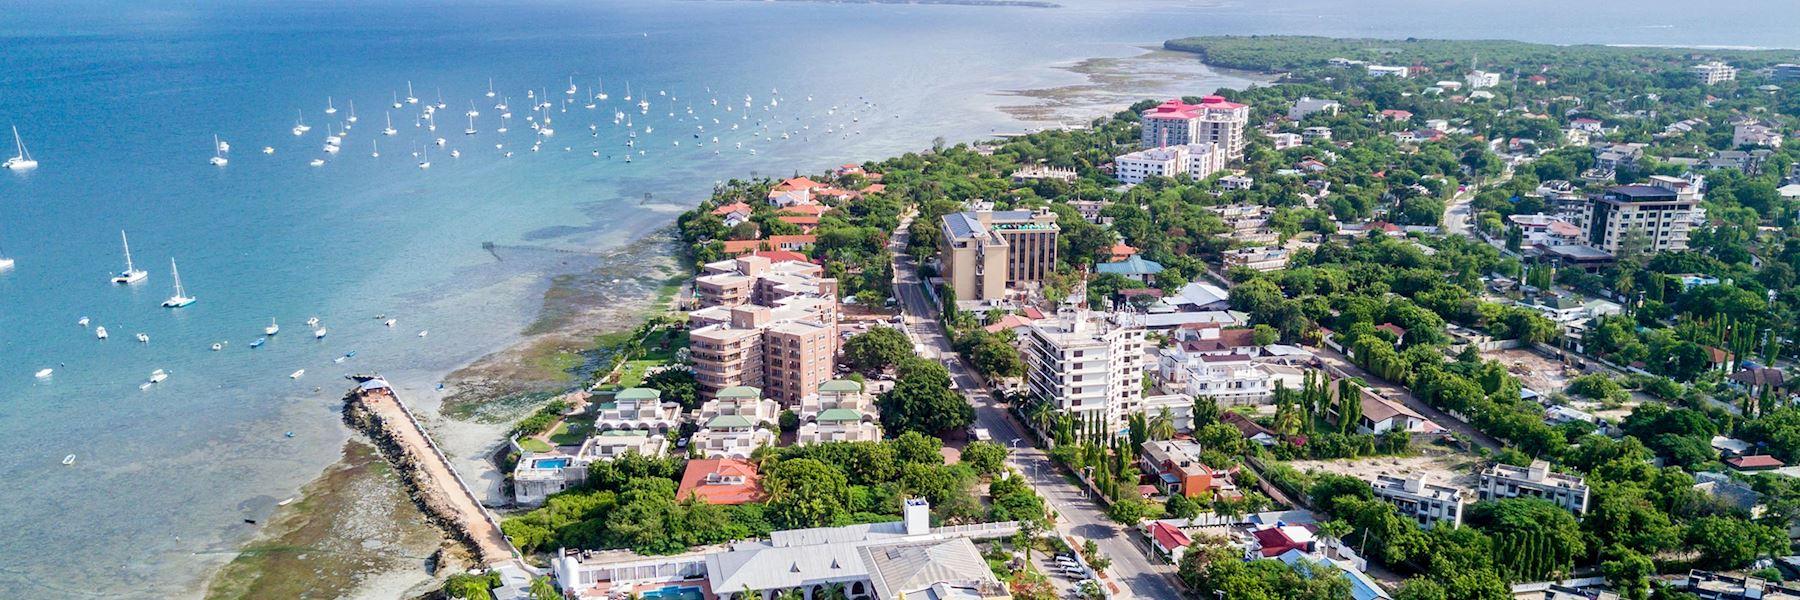 Visit Dar es Salaam, Tanzania